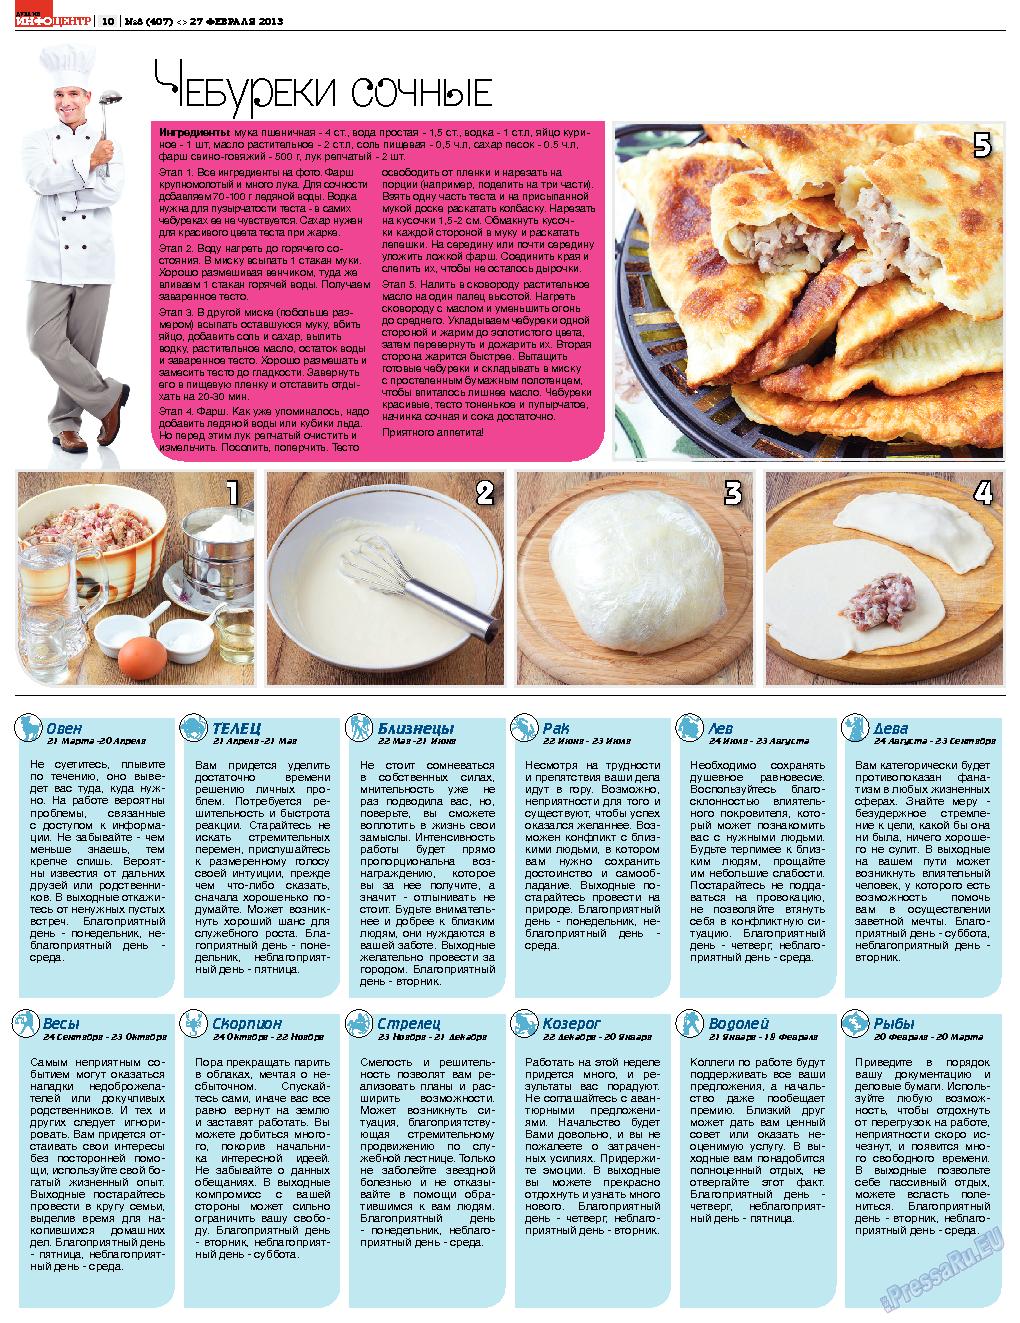 Дублин инфоцентр (газета). 2013 год, номер 8, стр. 10